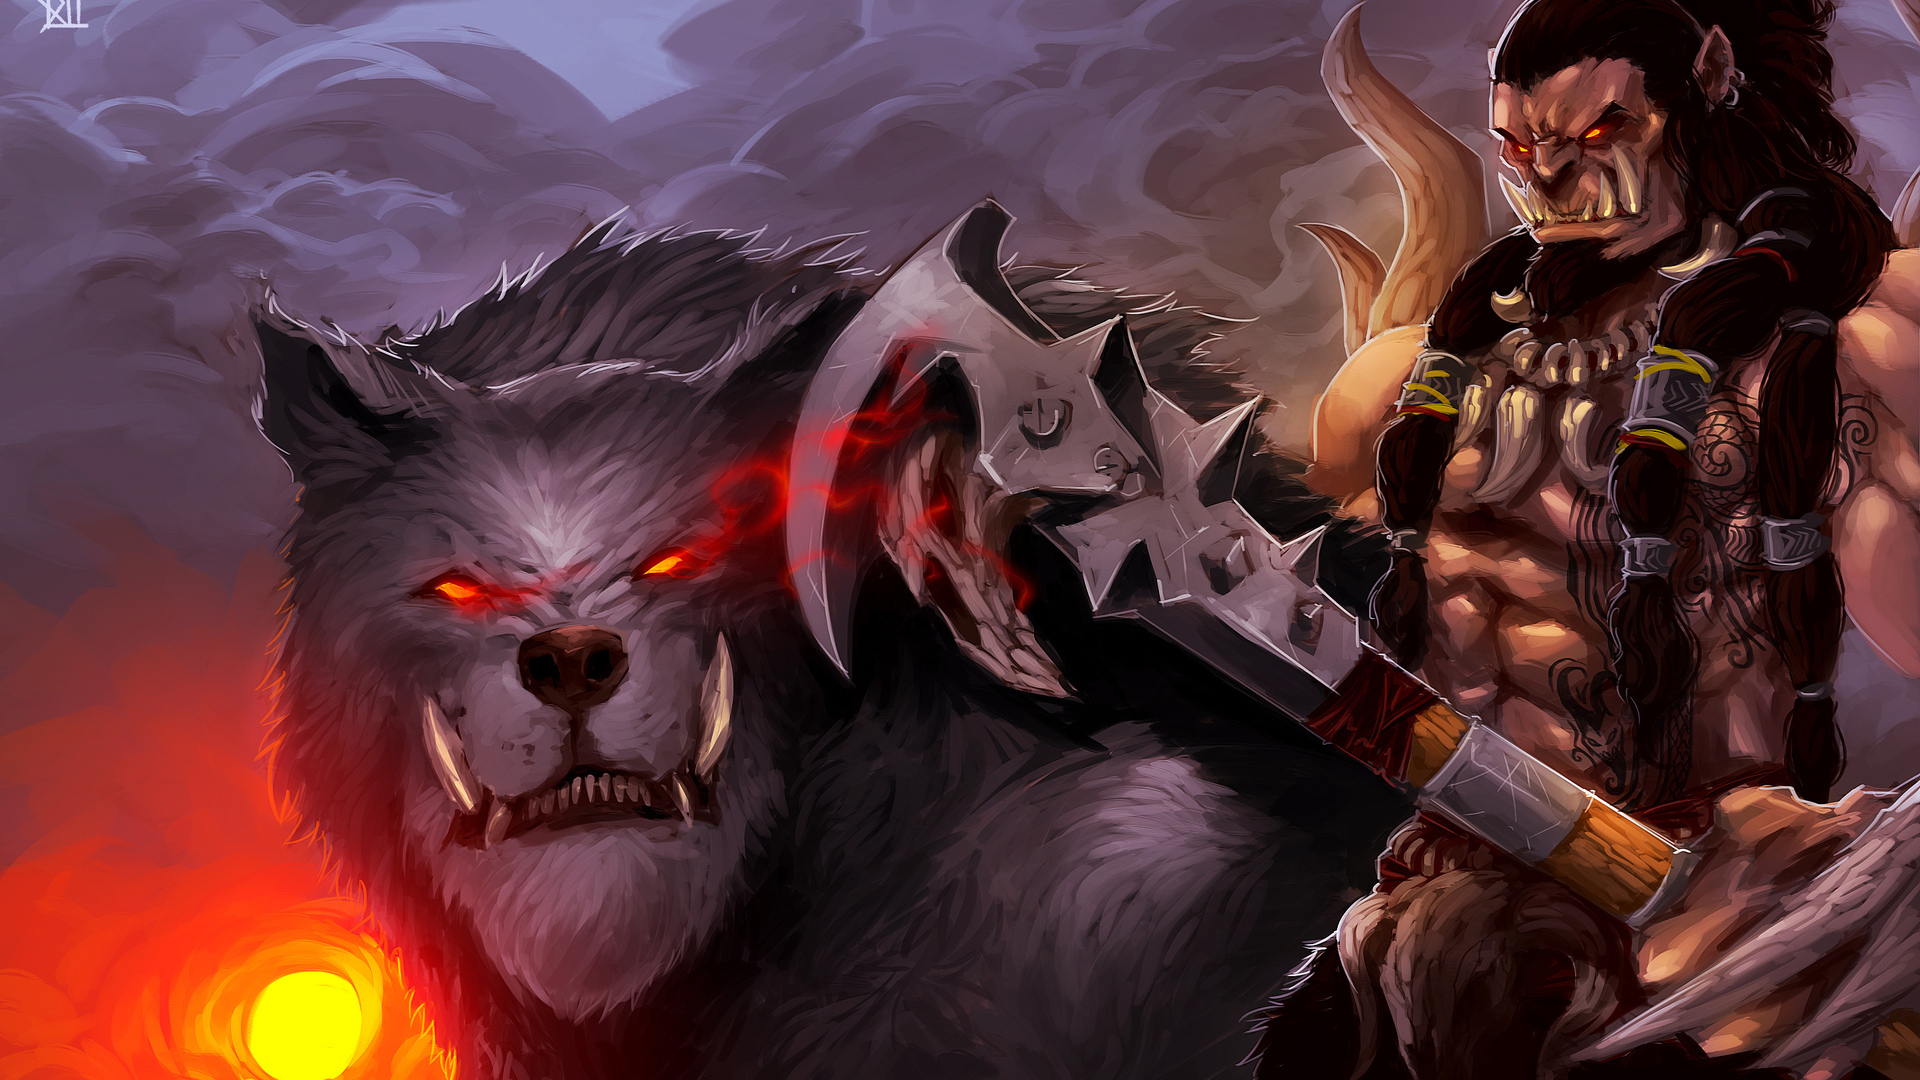 1920x1080 Axe Orc Warcraft Warrior Wolf Laptop Full Hd 1080p Hd 4k